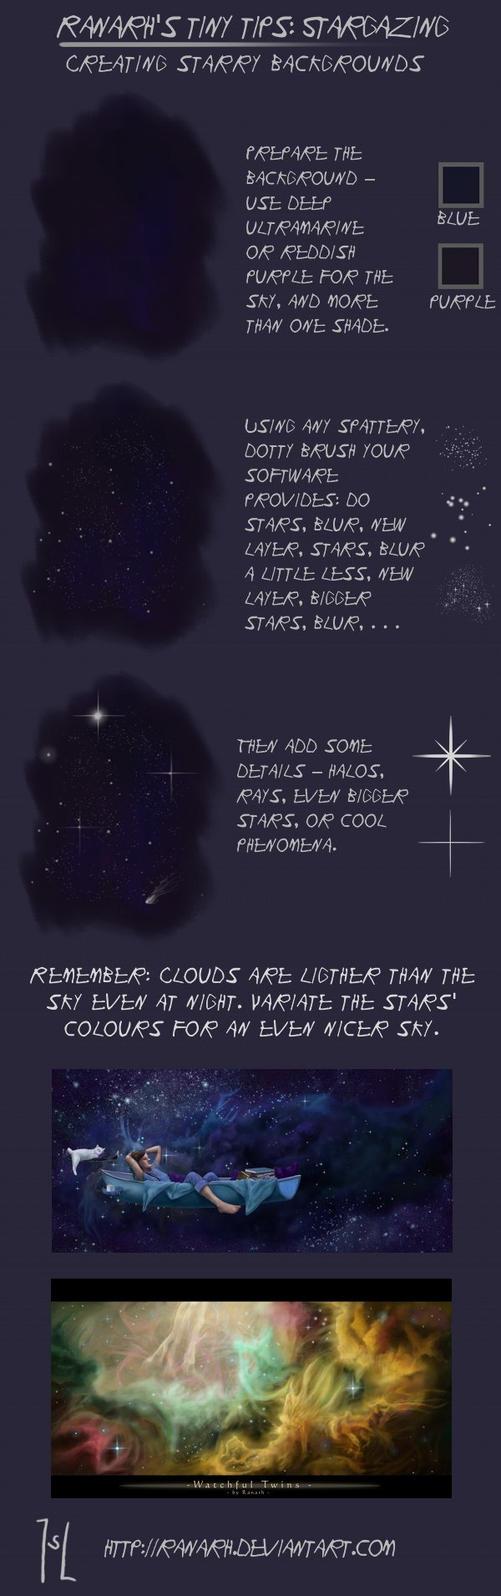 Tiny tips: Stargazing by Ranarh